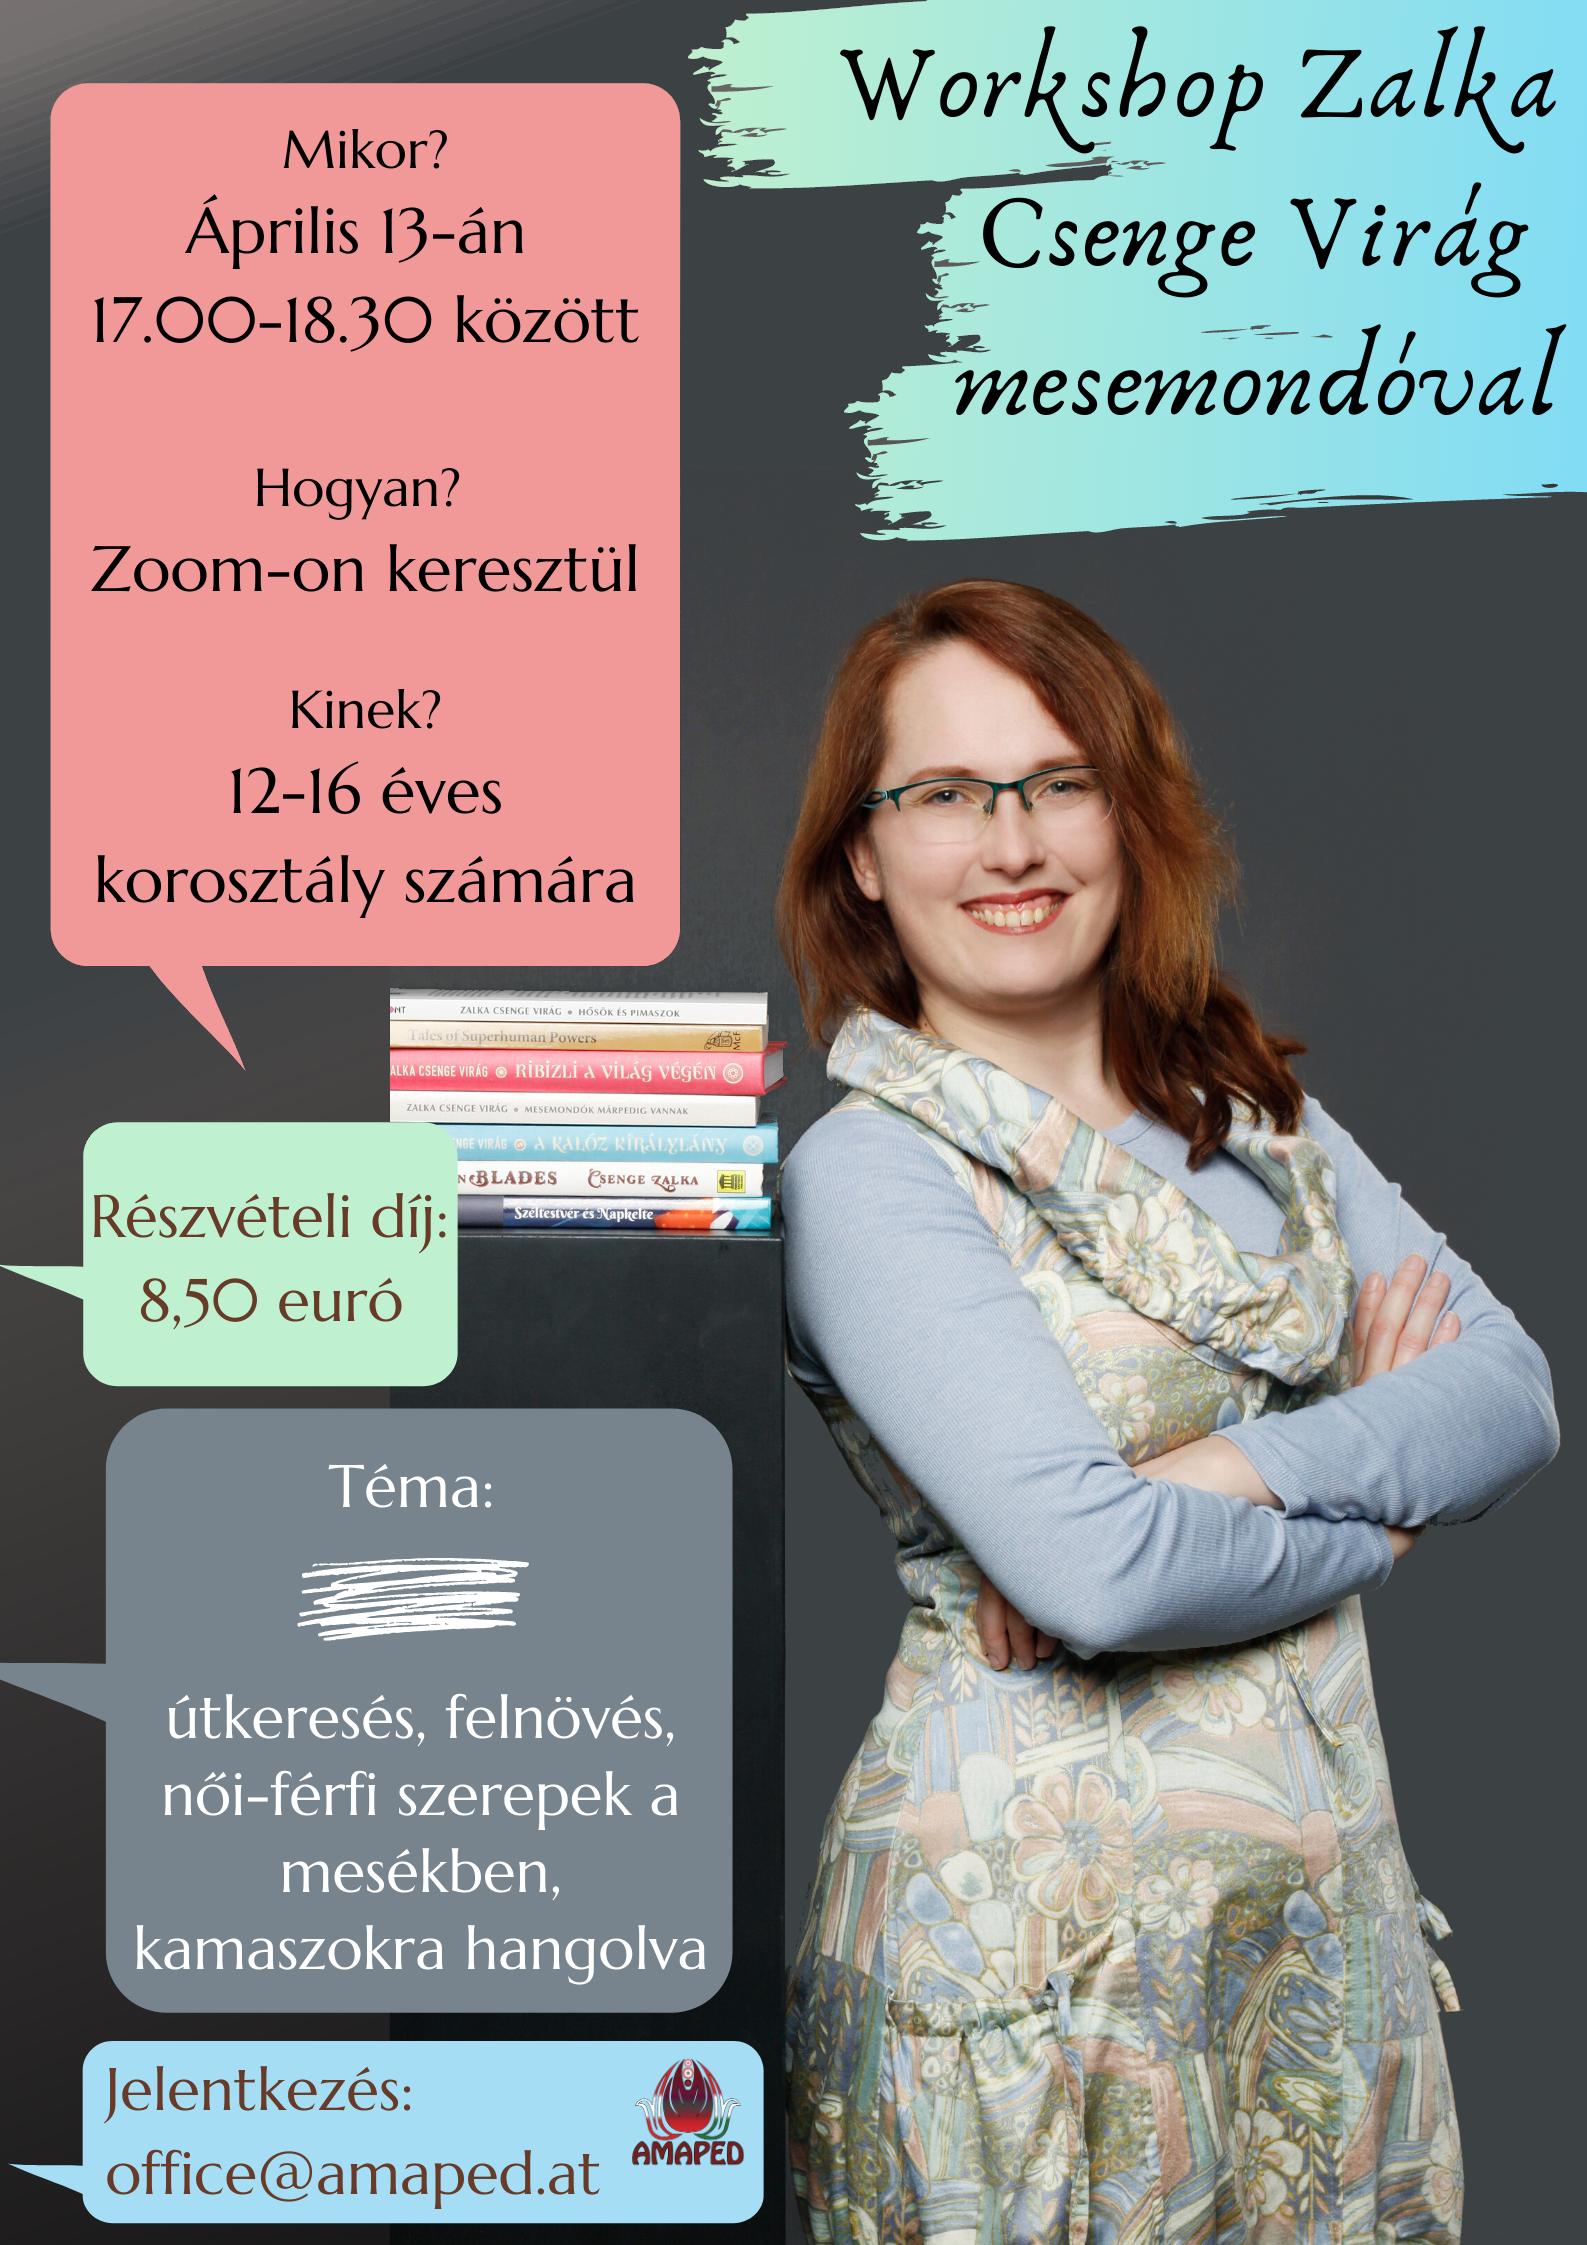 Workshop Zalka Csenge Virág mesemondóval